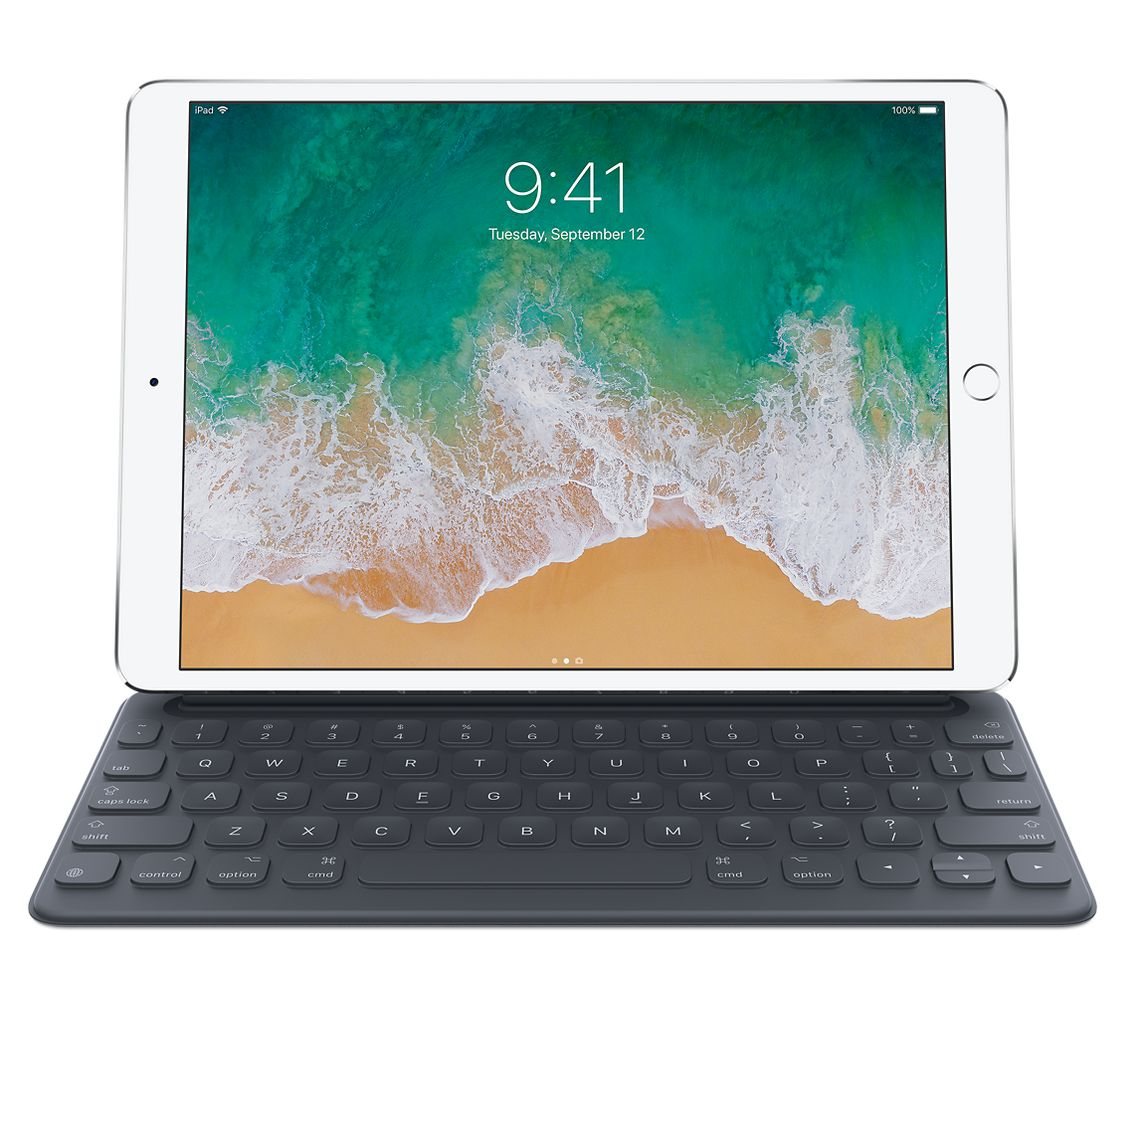 Refurbished 10 5 Inch Ipad Pro Wi Fi Cellular 512gb Rose Gold Apple